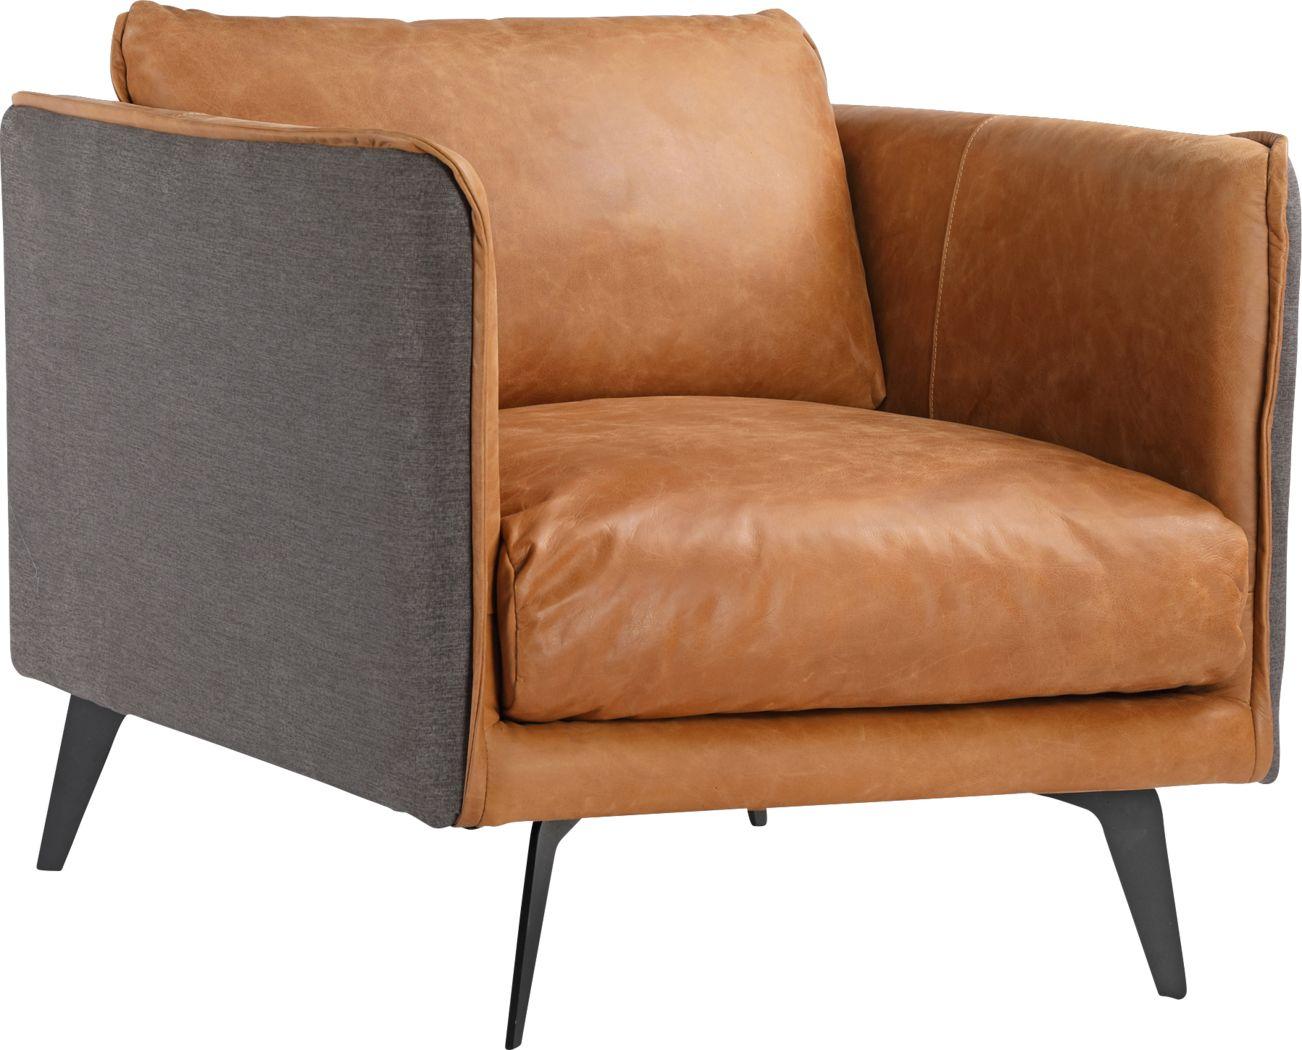 Hamor Orange Leather Accent Chair